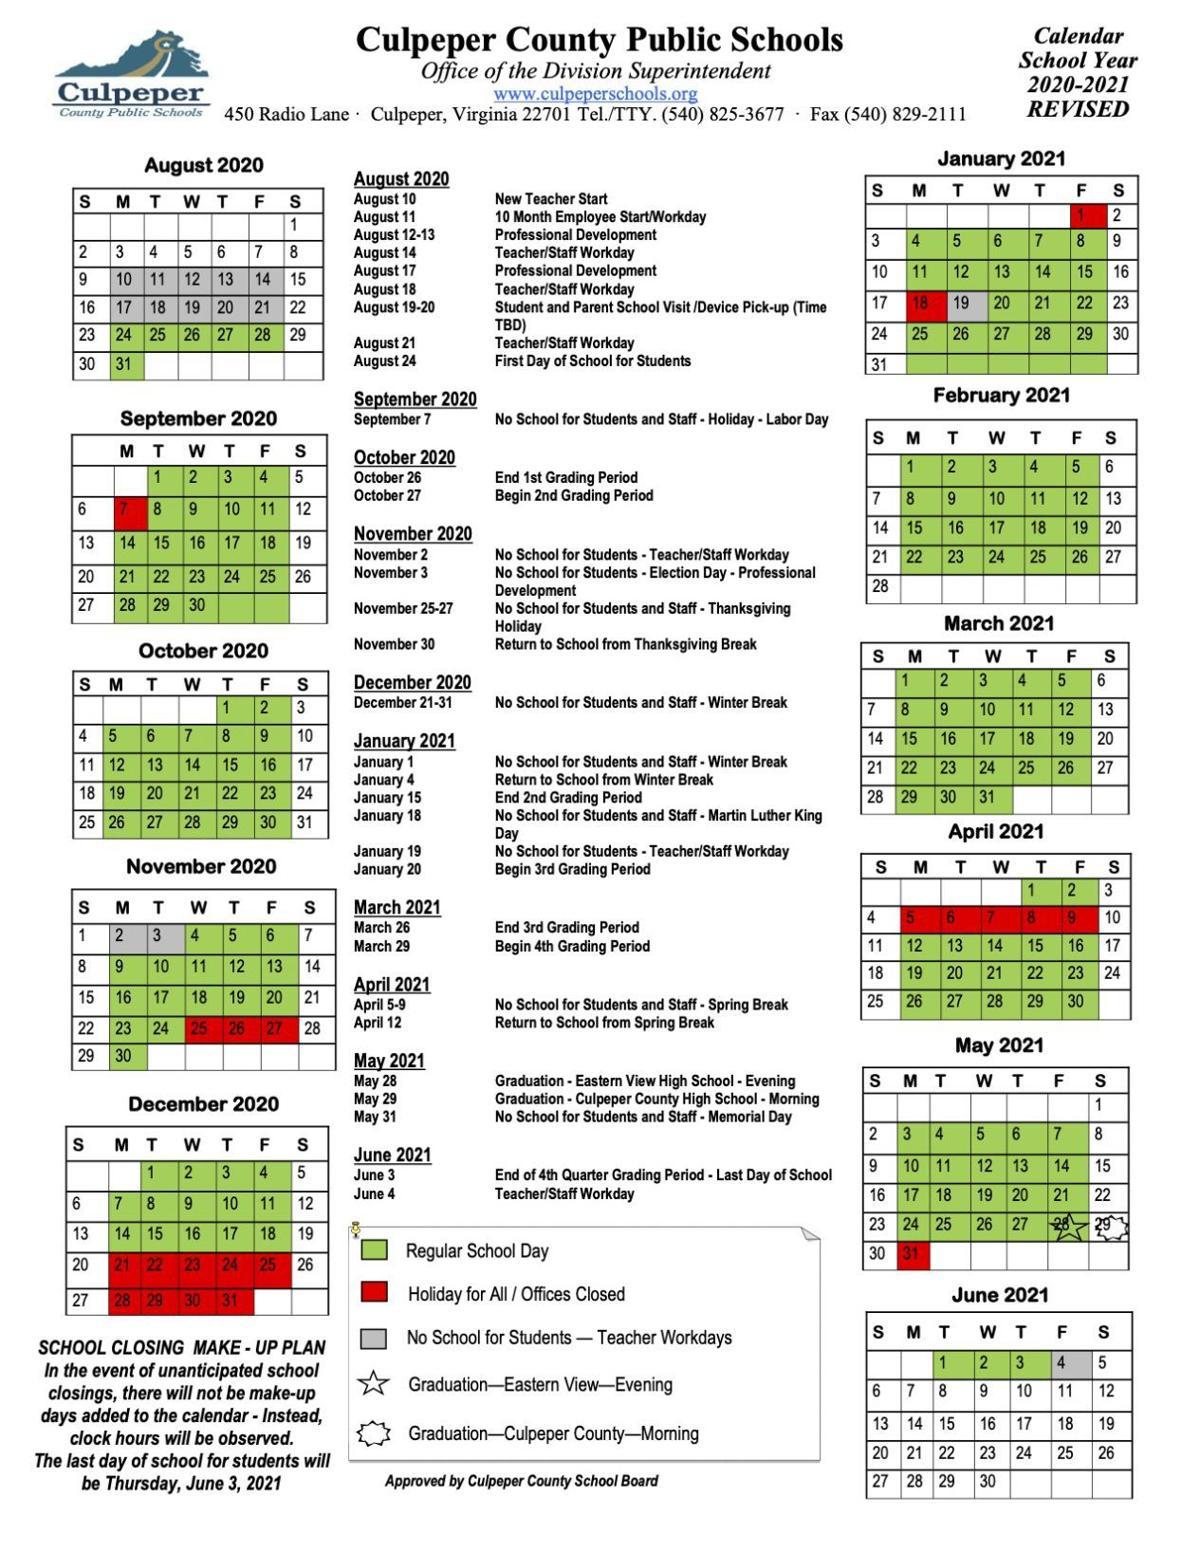 CCPS 2020 Revised Covid Calendar